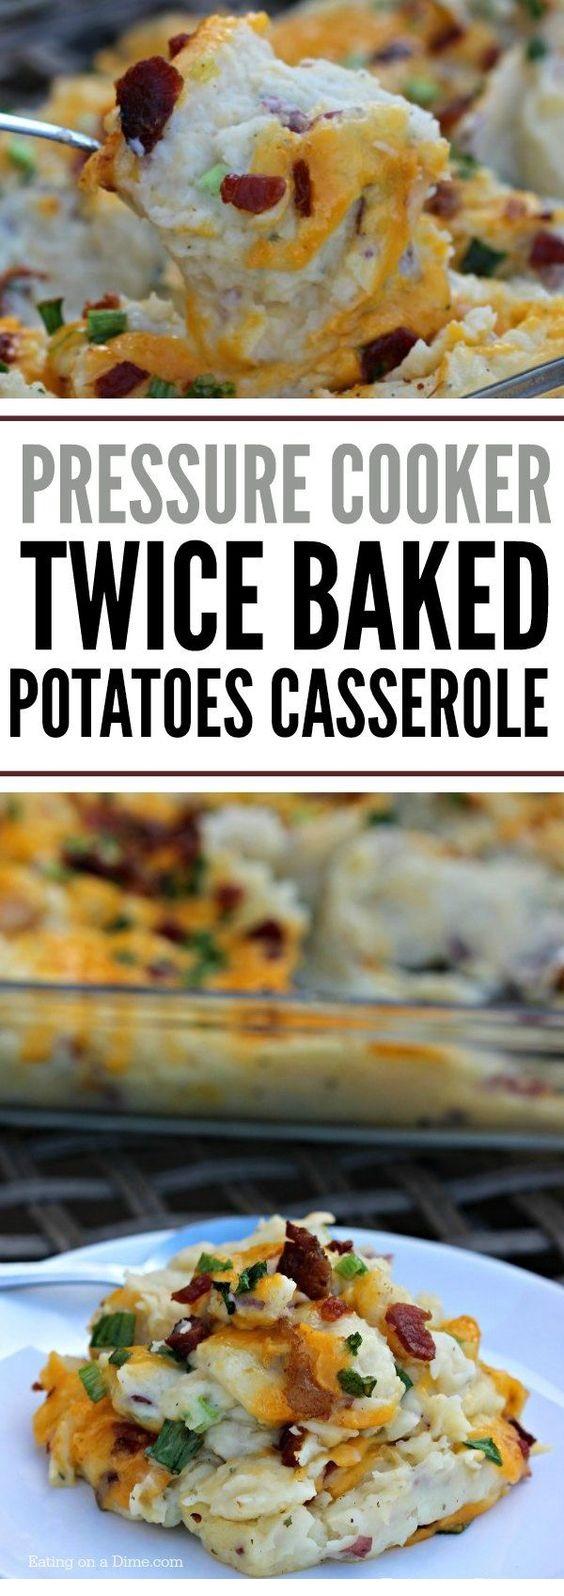 Instant Pot Twice Baked Potatoes Casserole Recipe